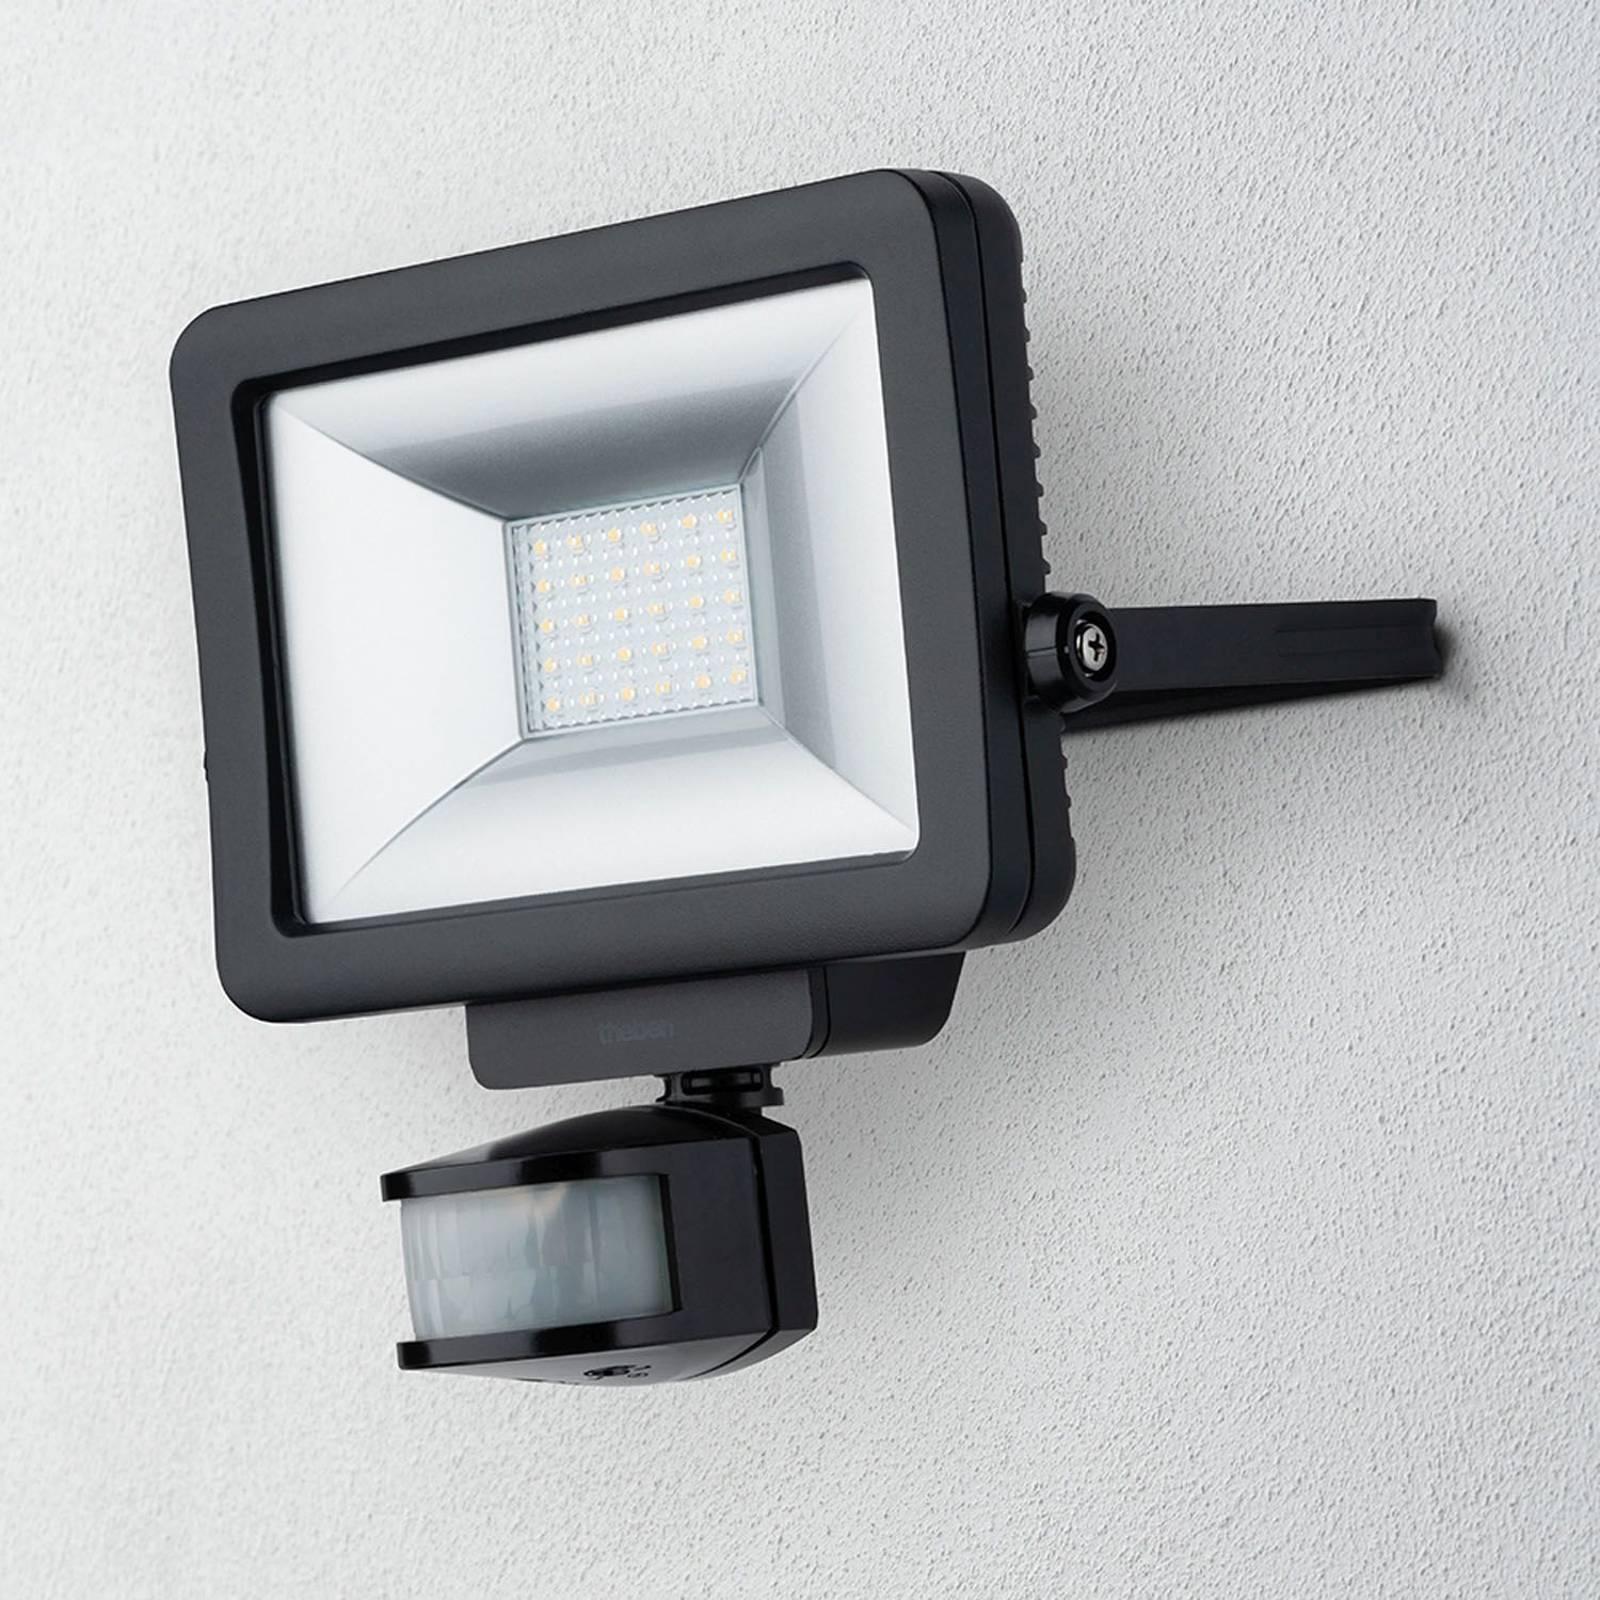 Theben theLeda B20L LED-kohdevalaisin ulos musta